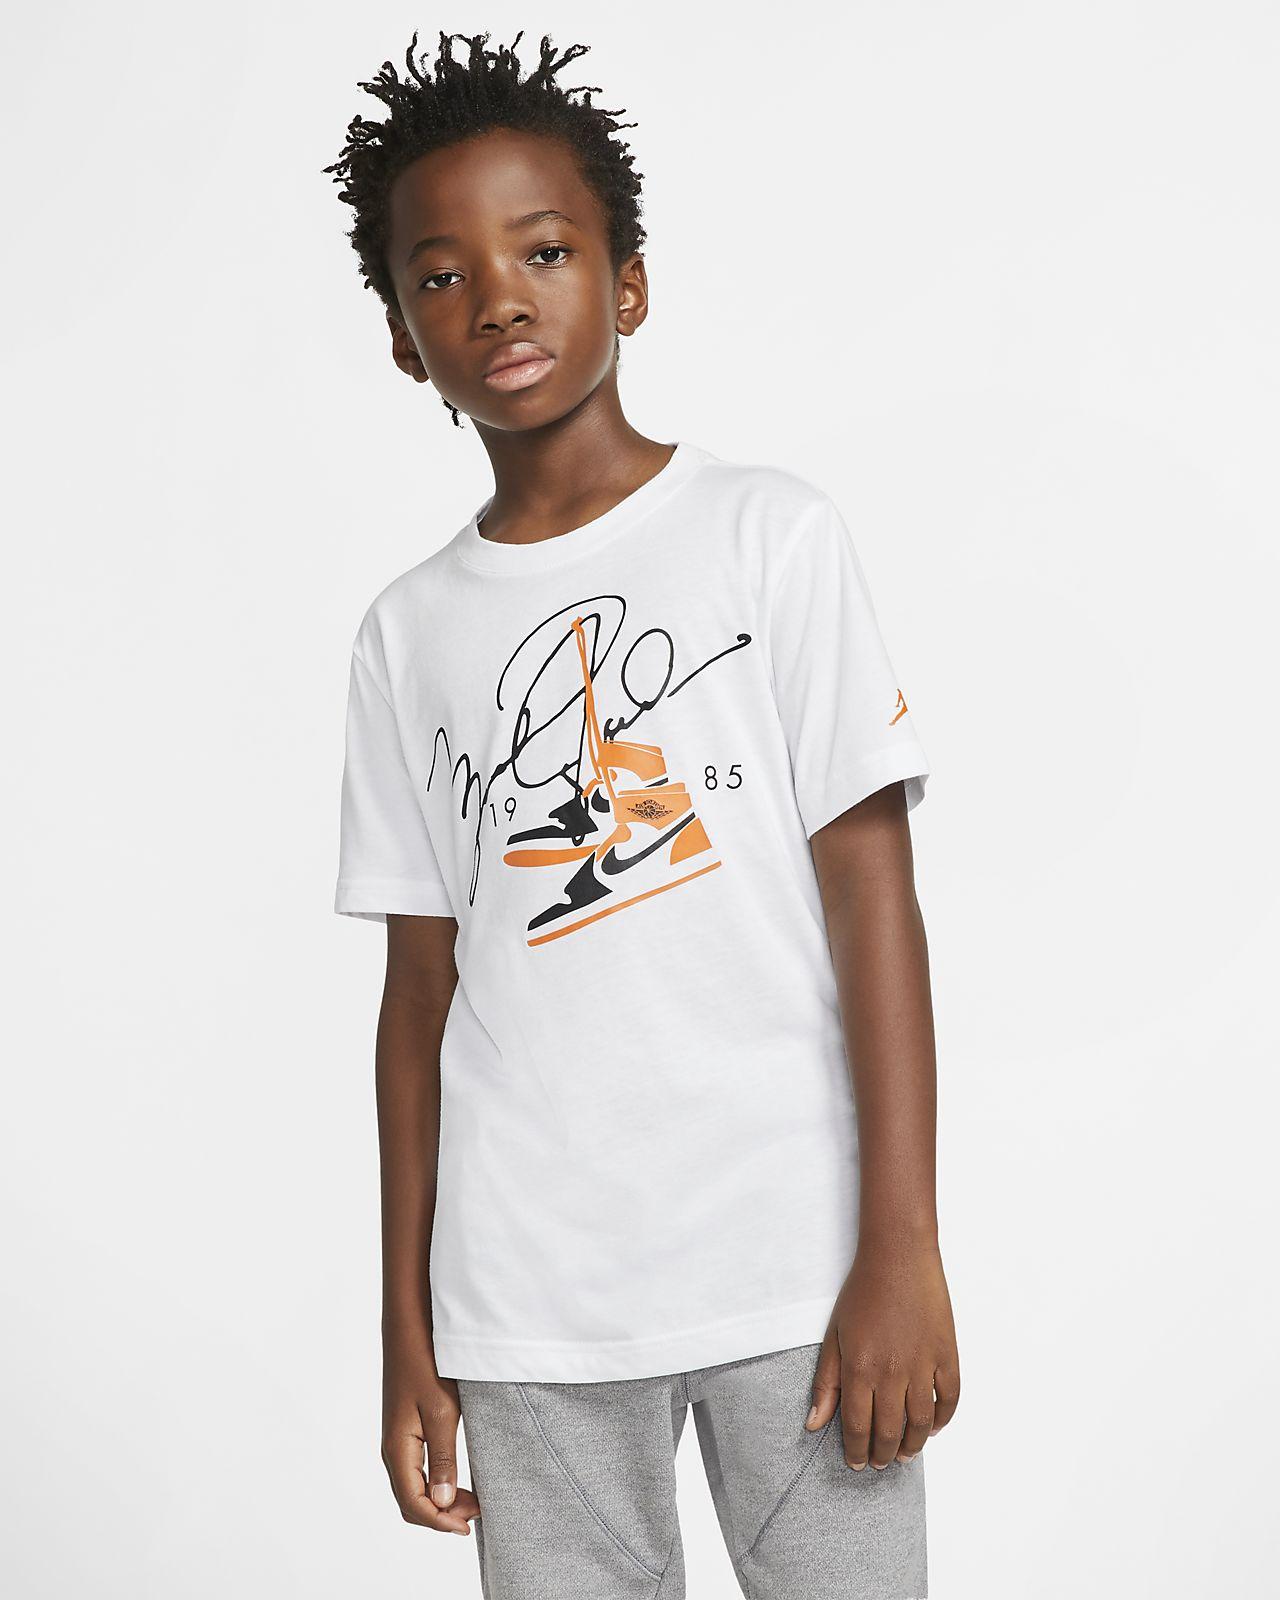 Jordan Older Kids' (Boys') Short-Sleeve T-Shirt